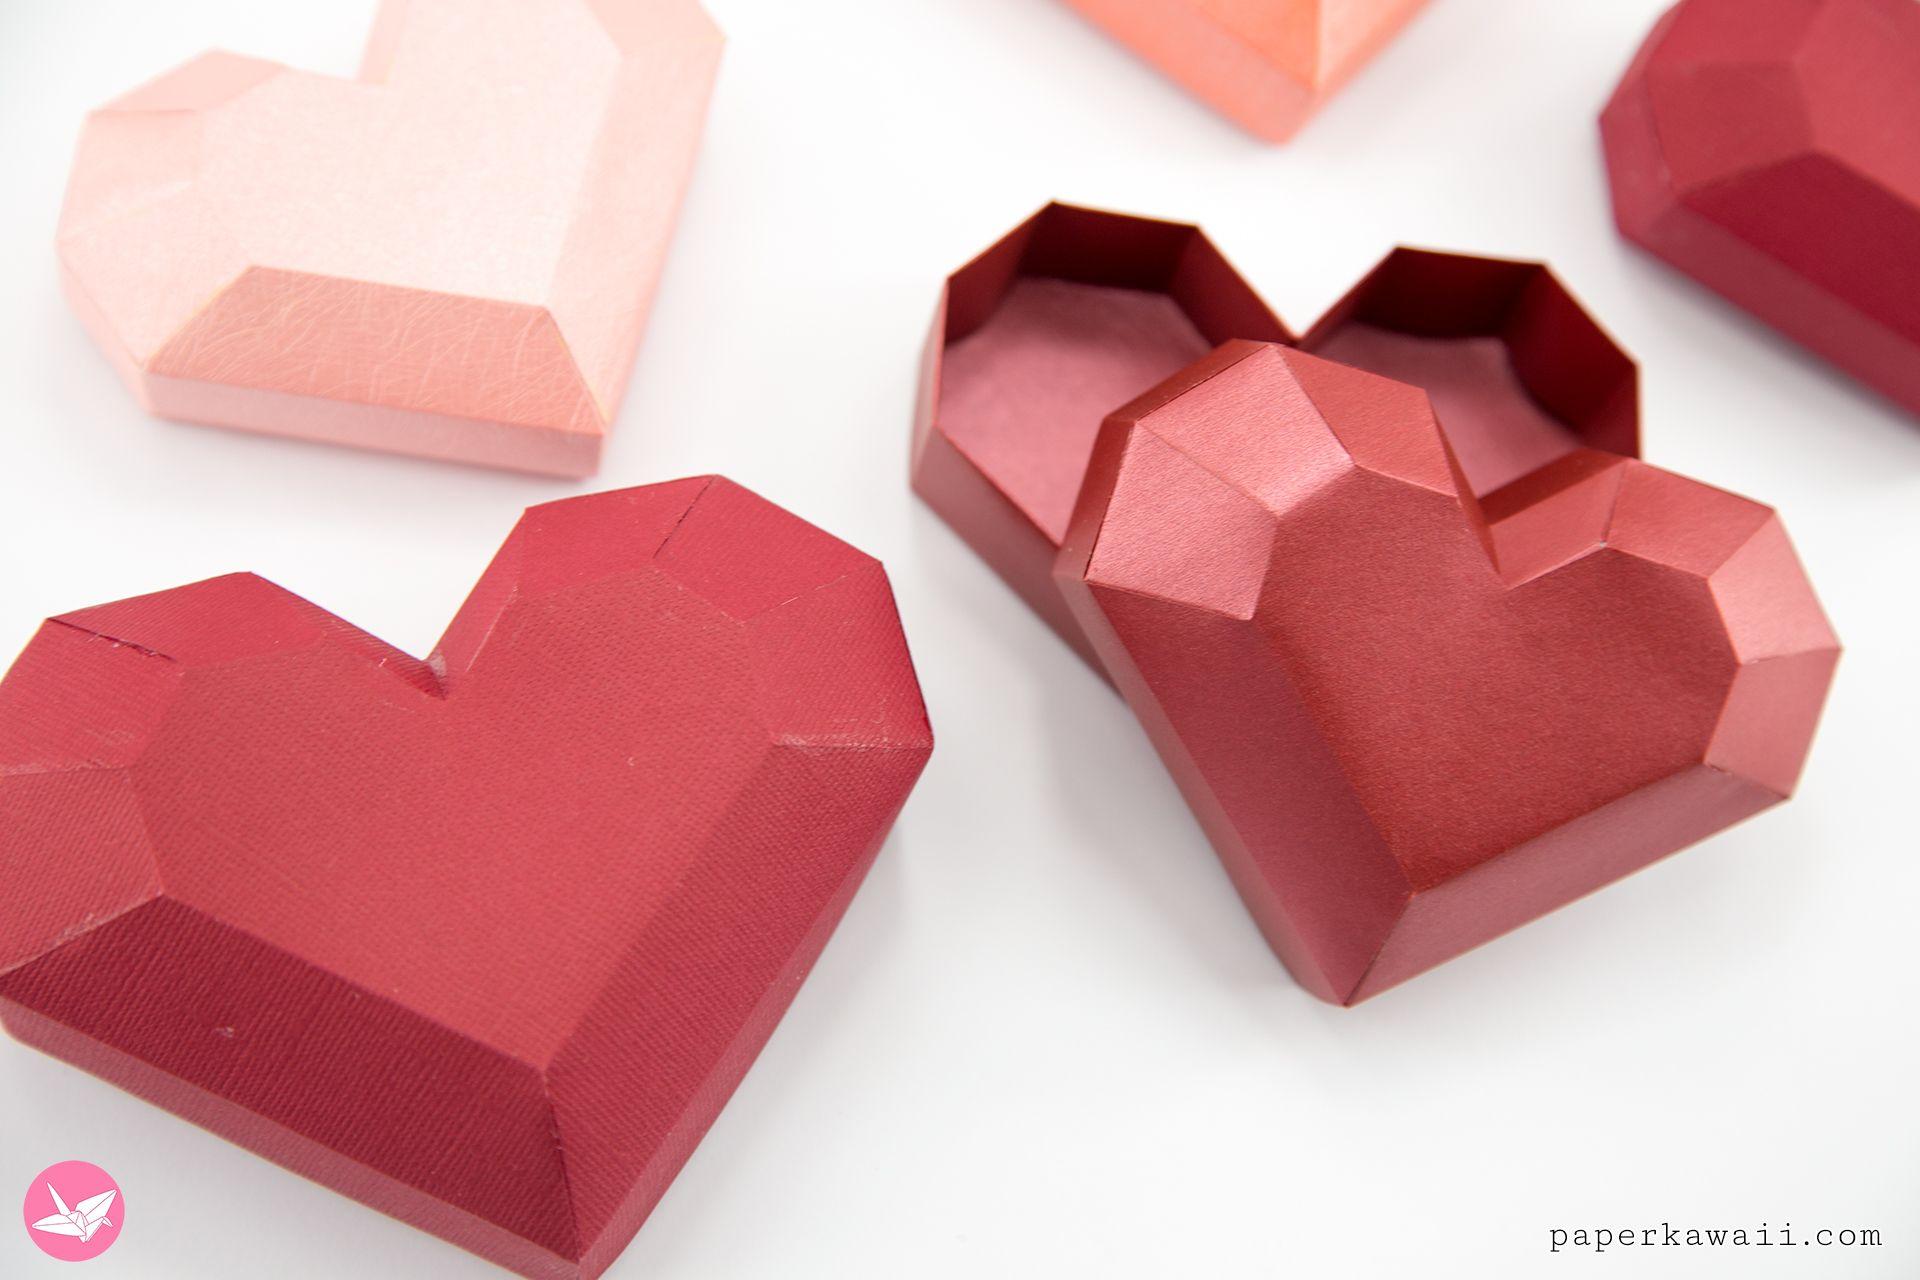 Paper Heart Box Tutorial Paper Kawaii In 2020 Heart Gift Box Paper Heart Heart Box Template